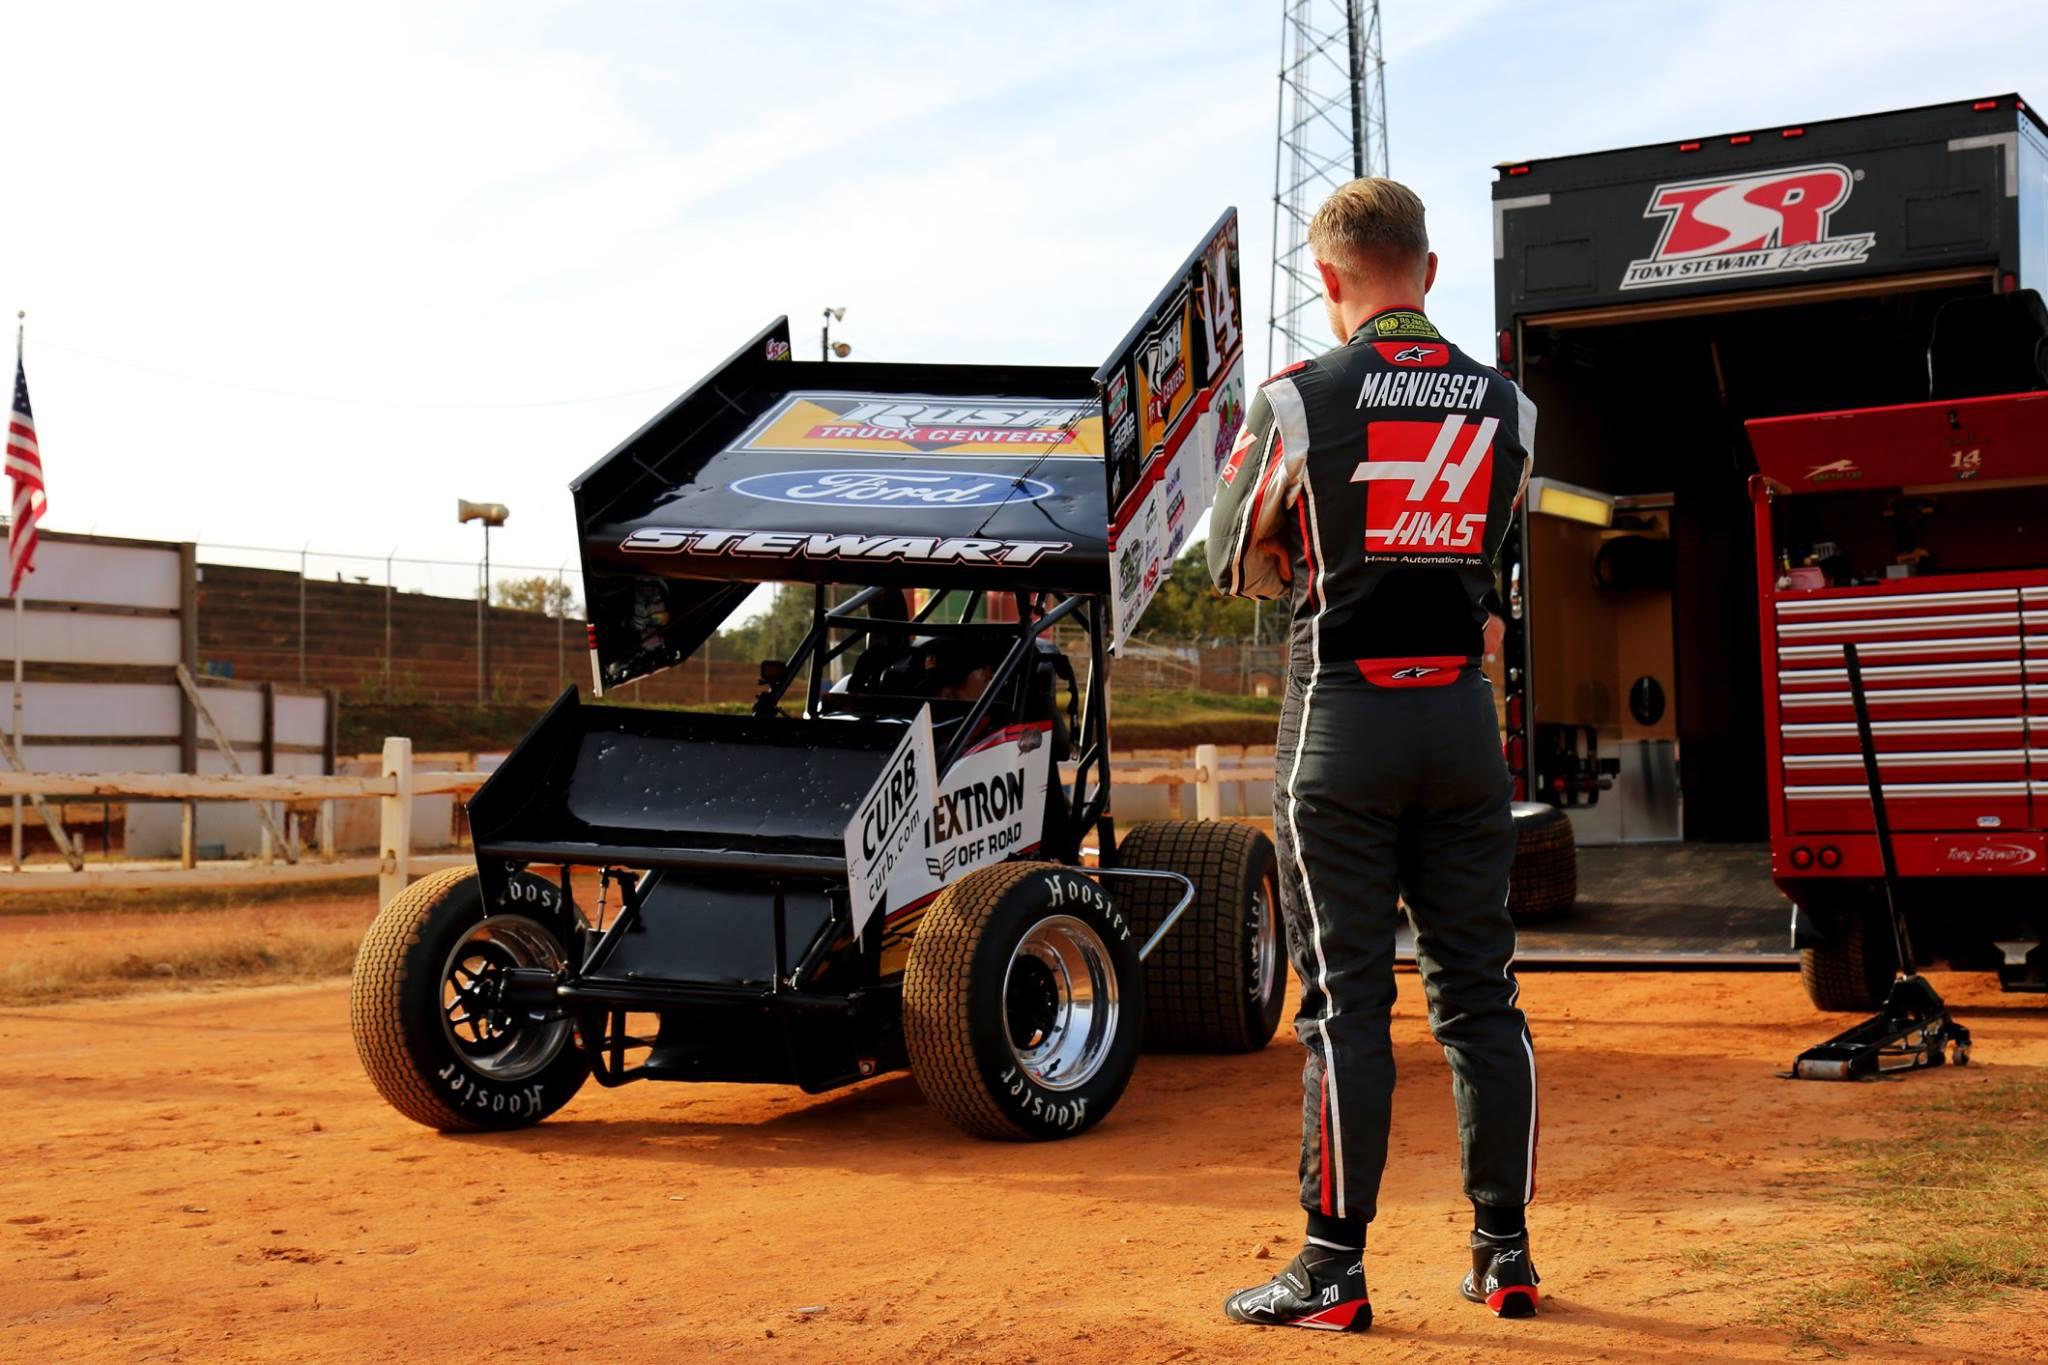 Kevin Magnussen drives the Stewart-Haas Racing sprint car at Carolina Speedway